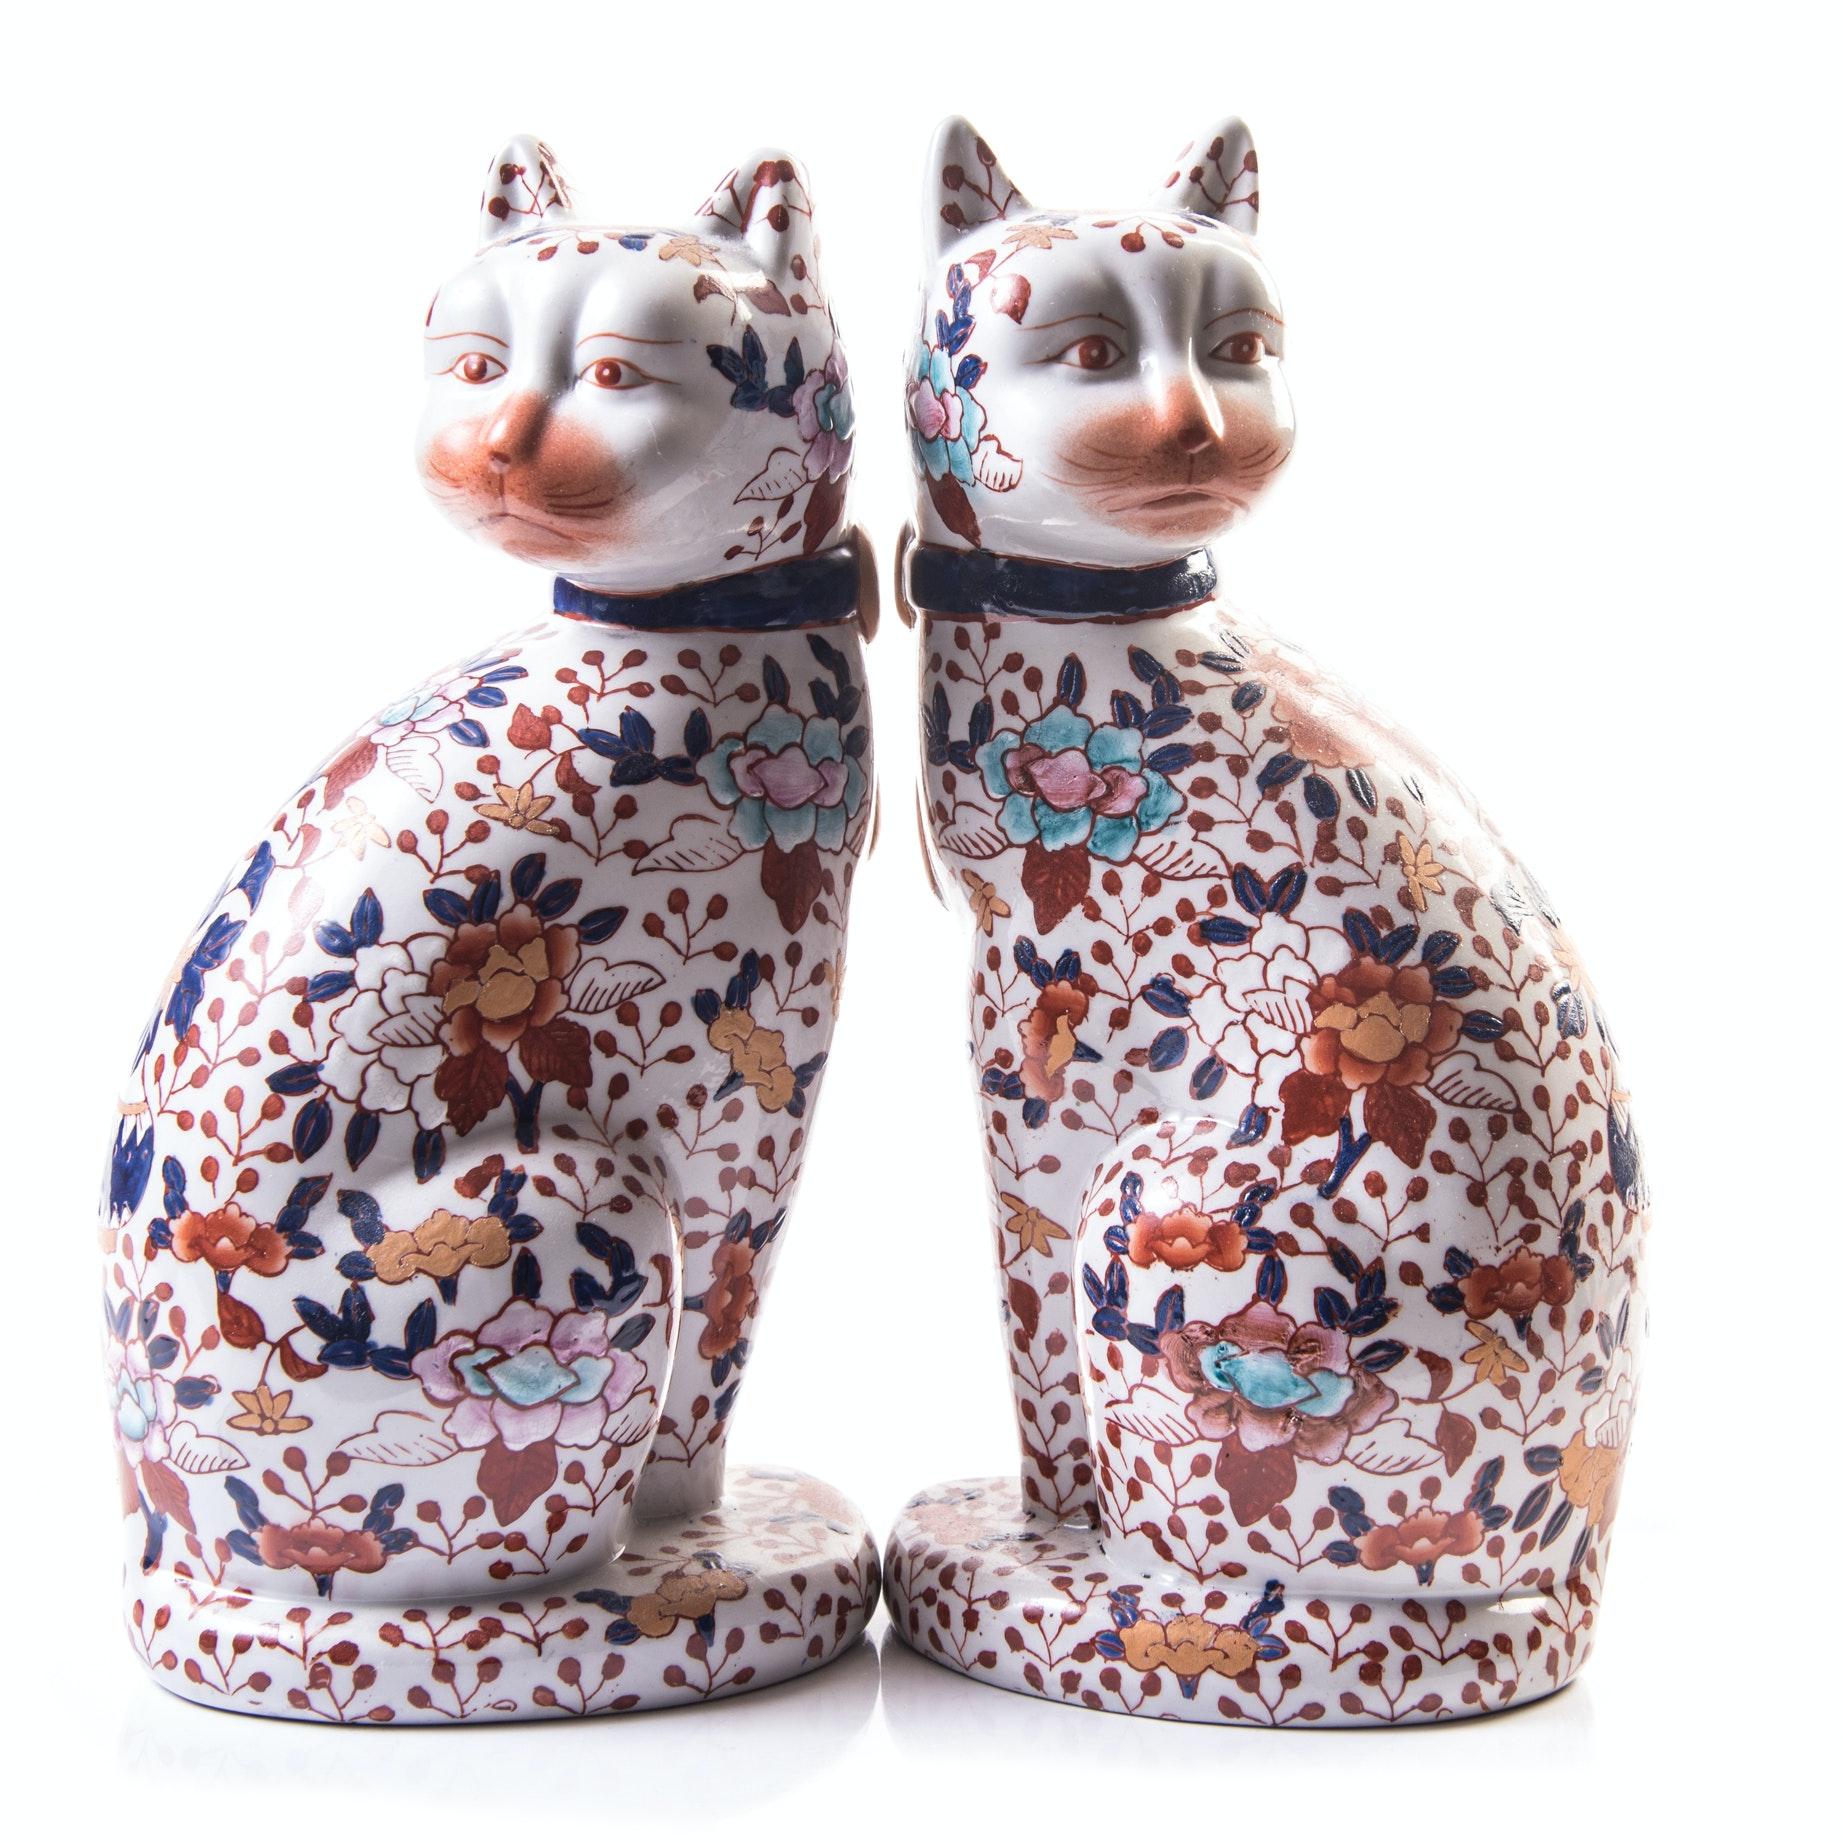 Chinese Ceramic Imari Style Cat Figurines